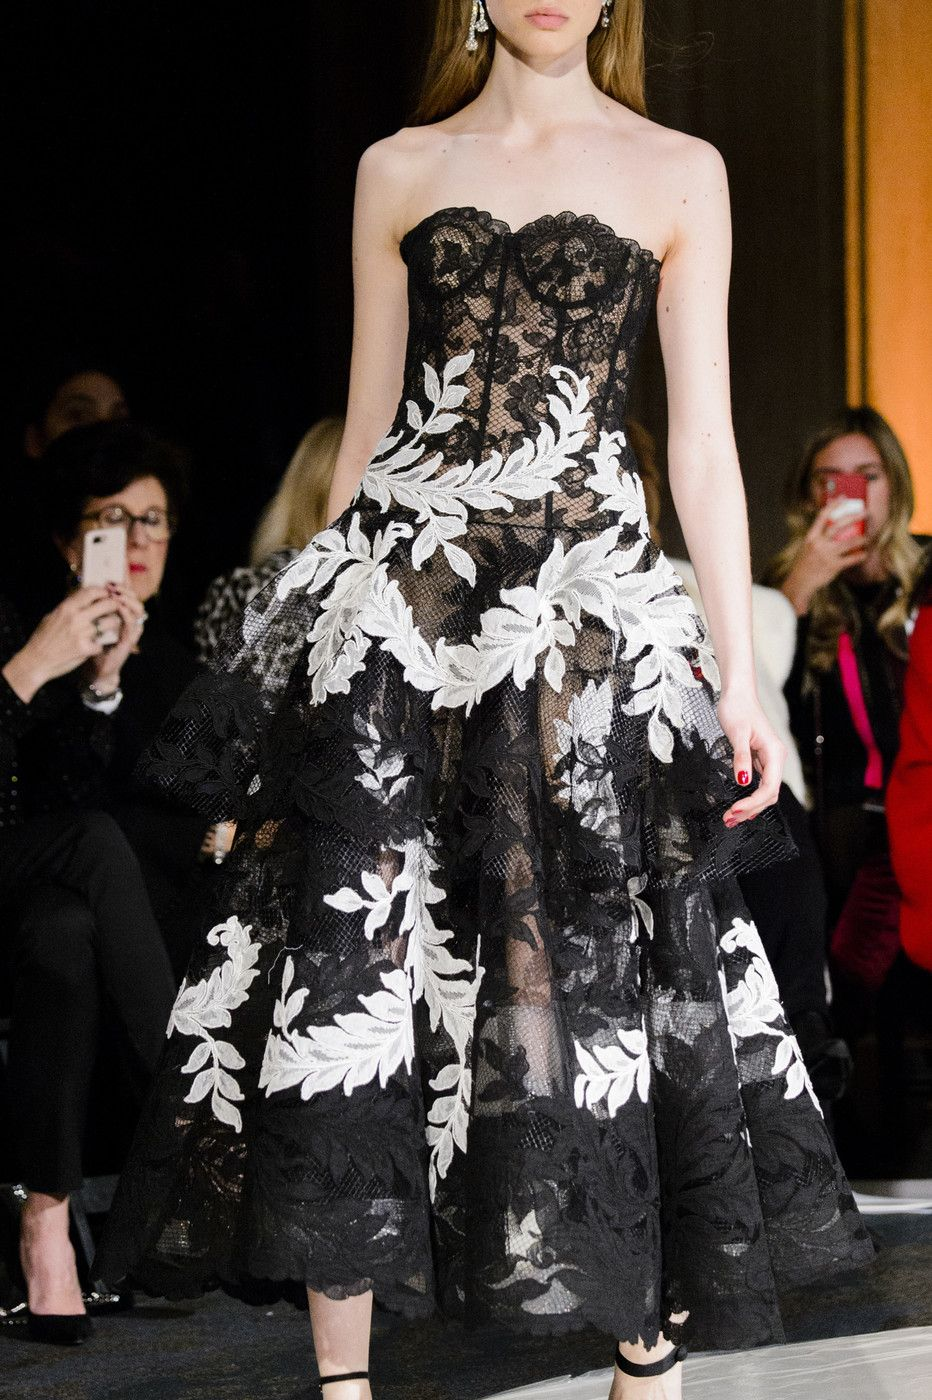 Oscar de la renta fall rtw gowns oh such beautiful gowns